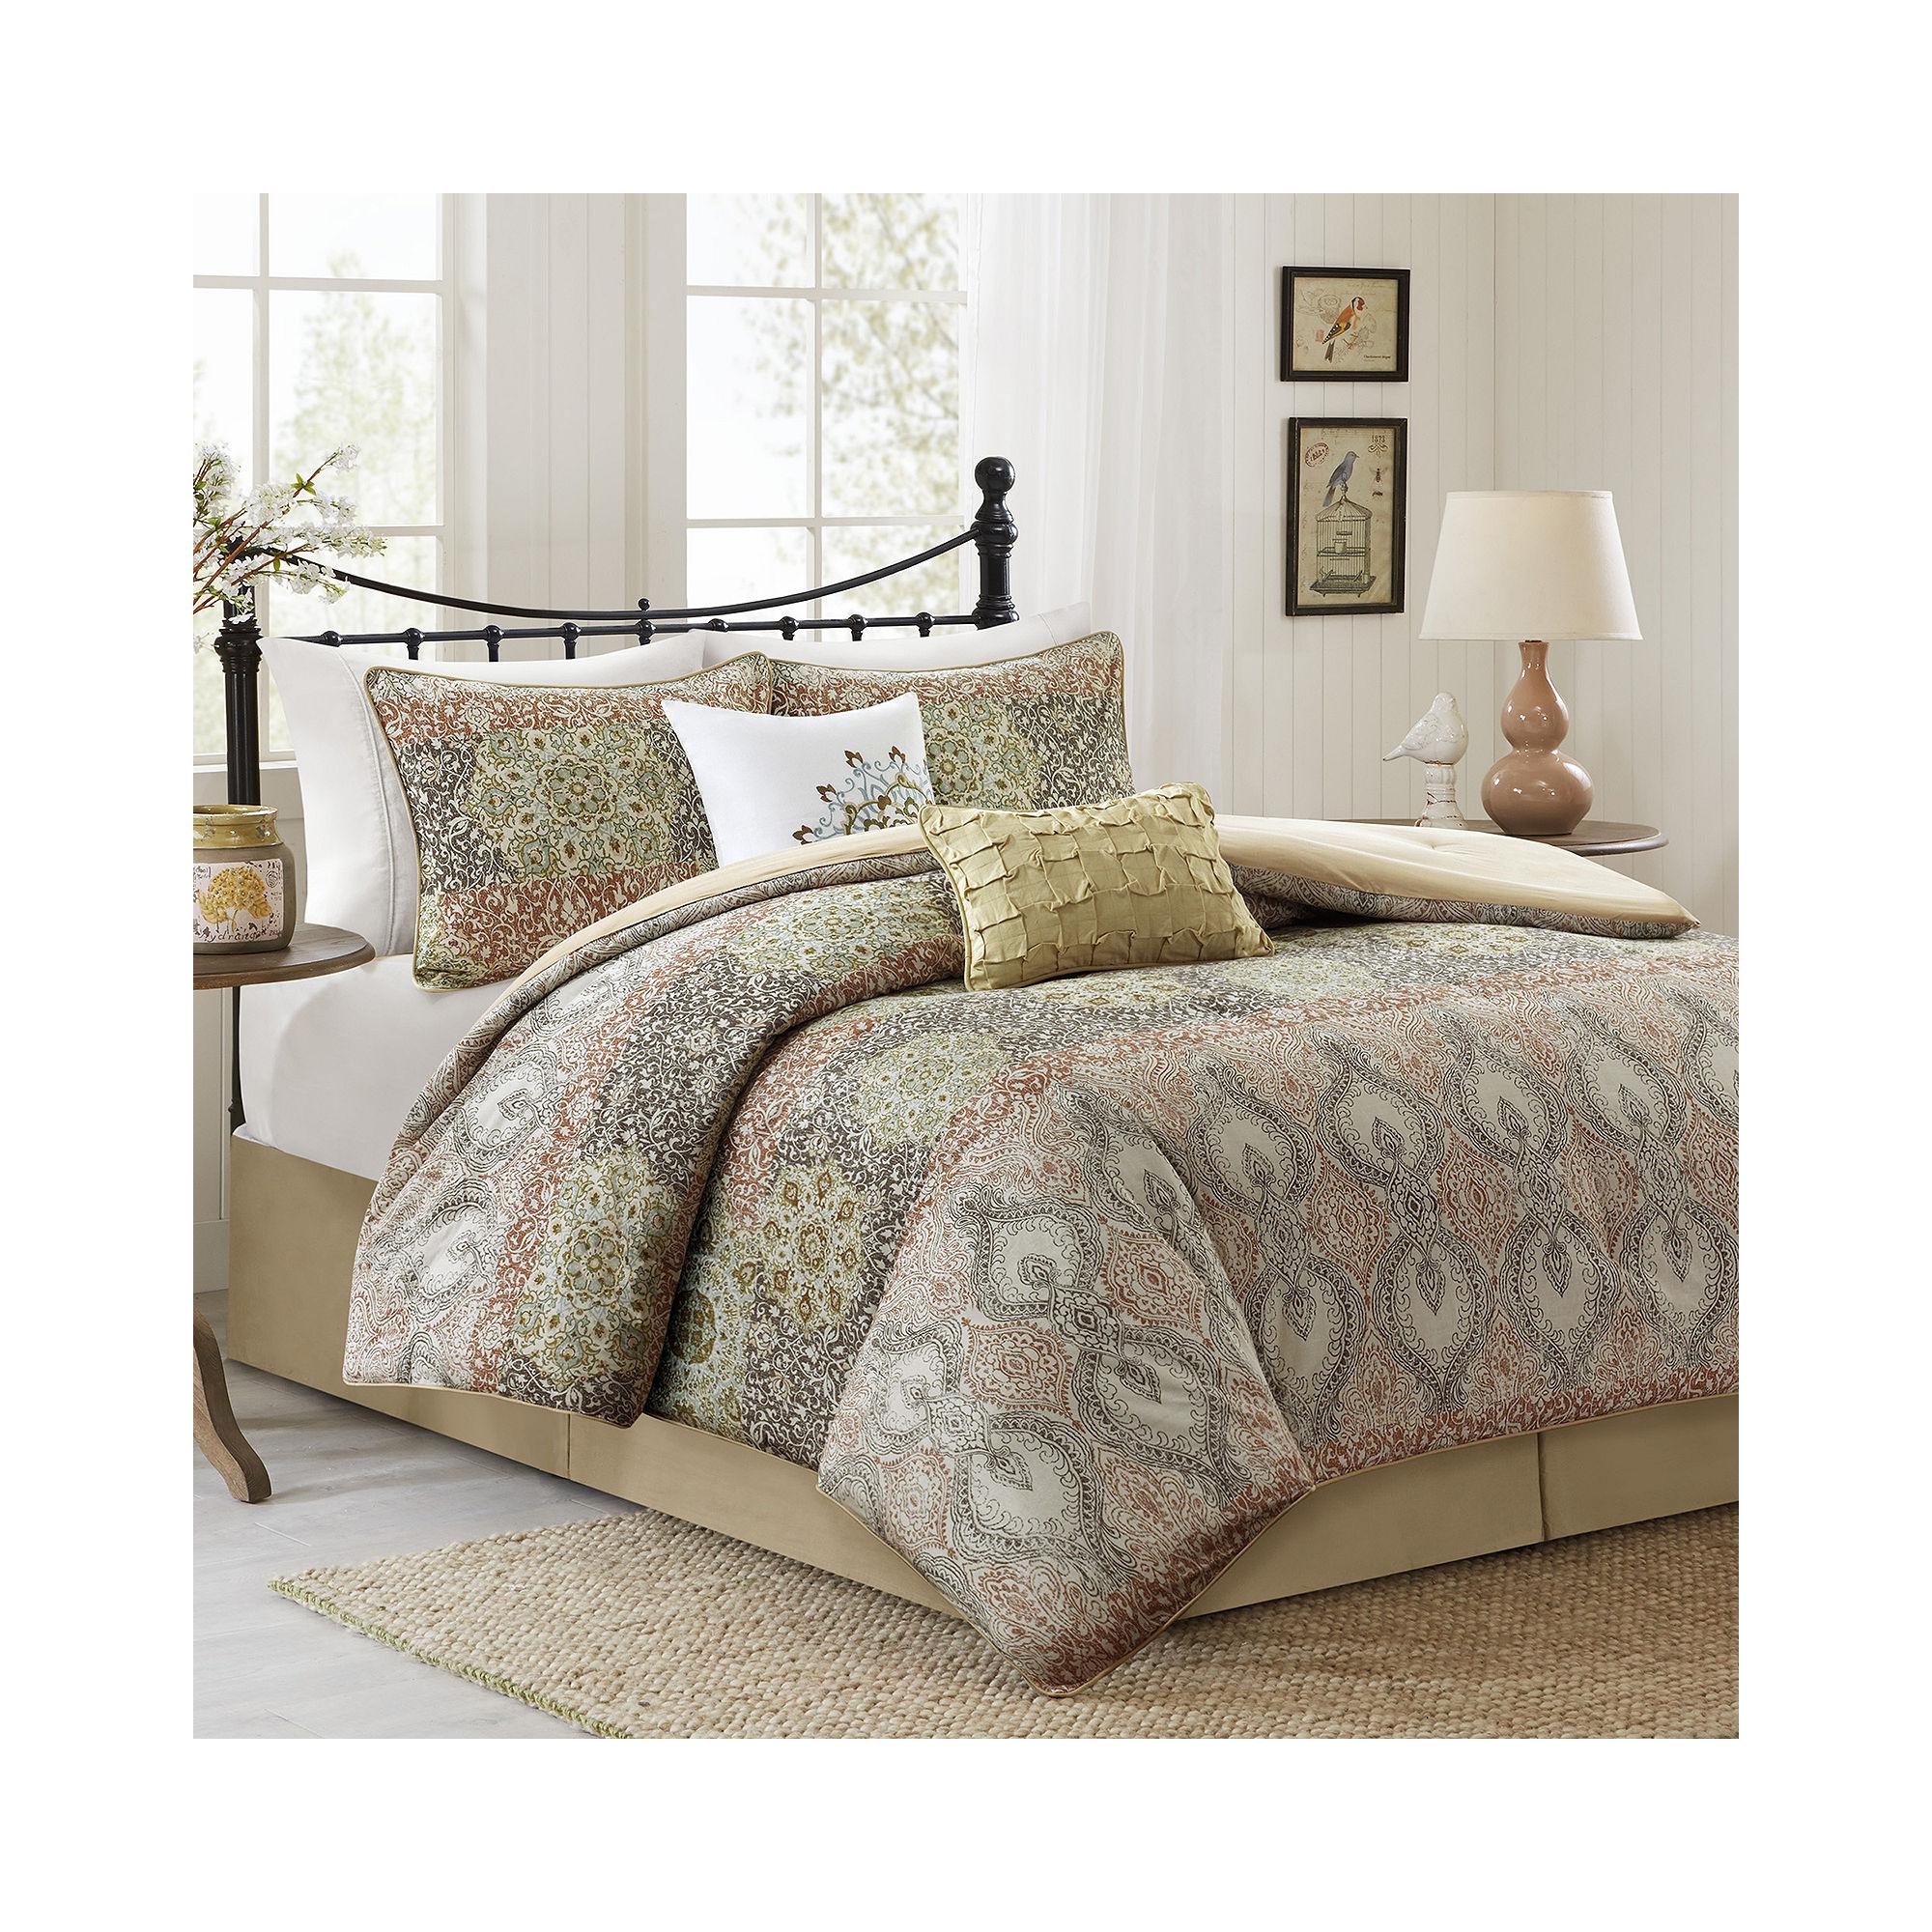 Cheap Harbor House Sanya 6 Pc Comforter Set Limited